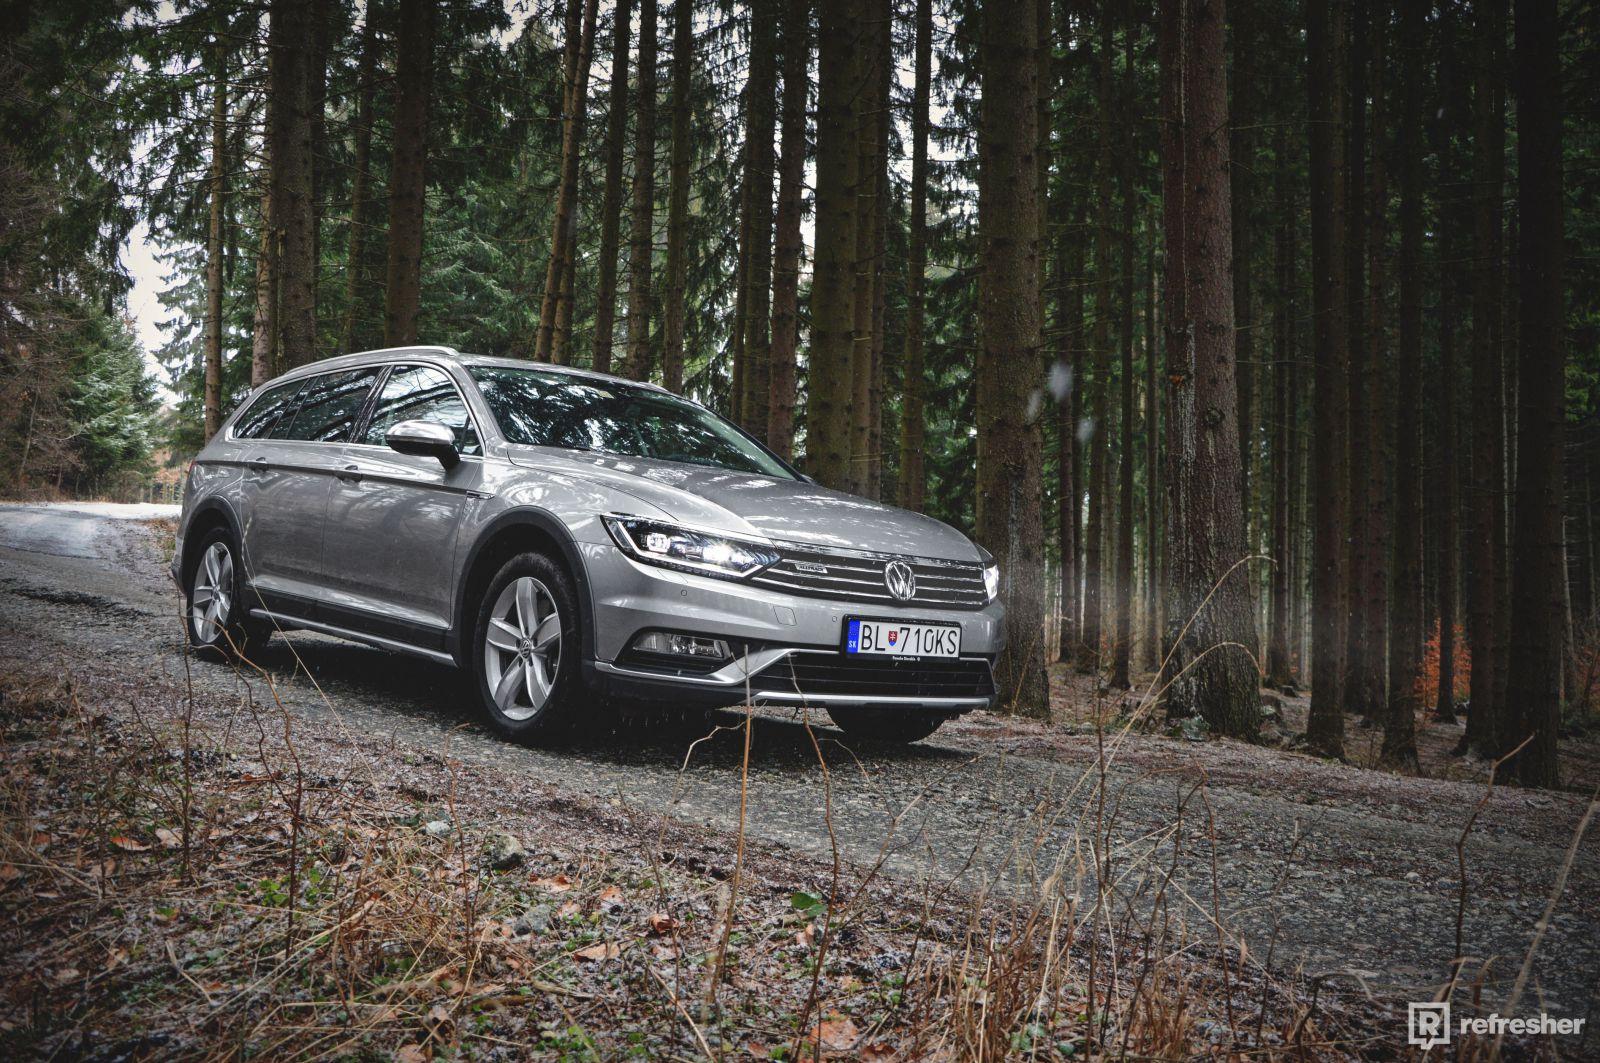 Volkswagen Passat Alltrack 2.0 BiTDI 4Motion: Všestranný temperament (Test)